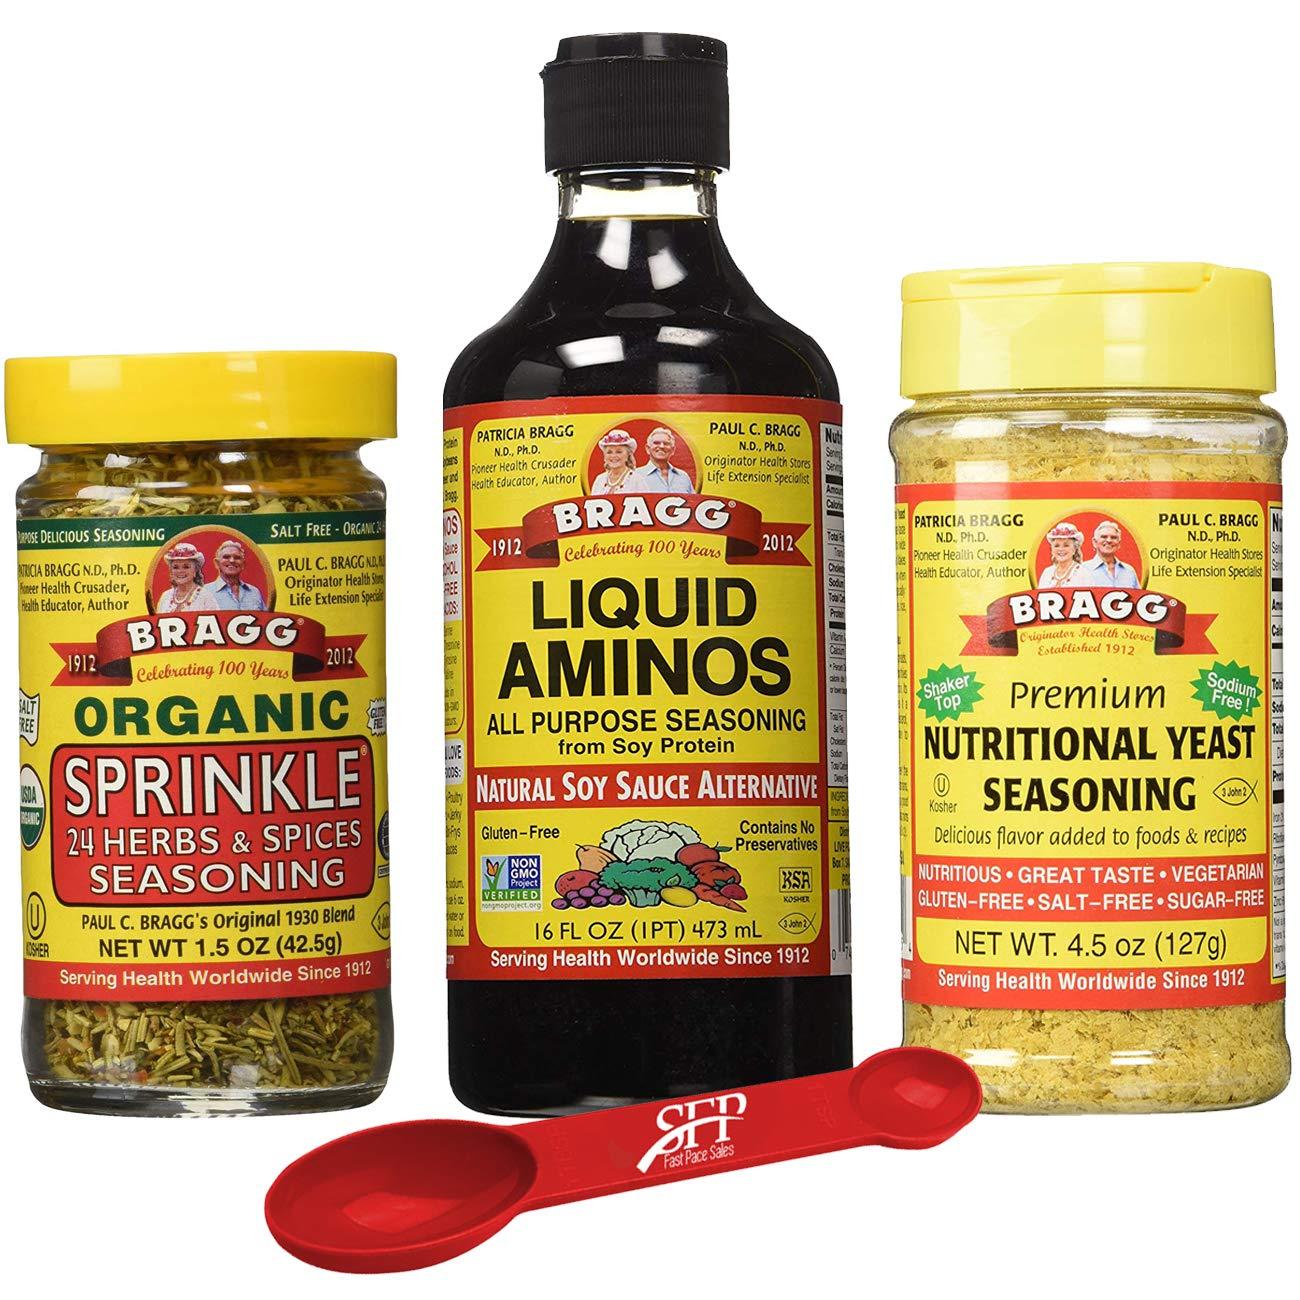 Bragg's Organic Kitchen Variety Pack: Bragg Organic Liquid Aminos 16 oz + Bragg's Sprinkle Seasoning Blend - 24 Herb & Spices, 1.5 Oz + Bragg's Nutrional Yeast Supplement, 4.5 Oz by Bragg's Organic (Image #1)